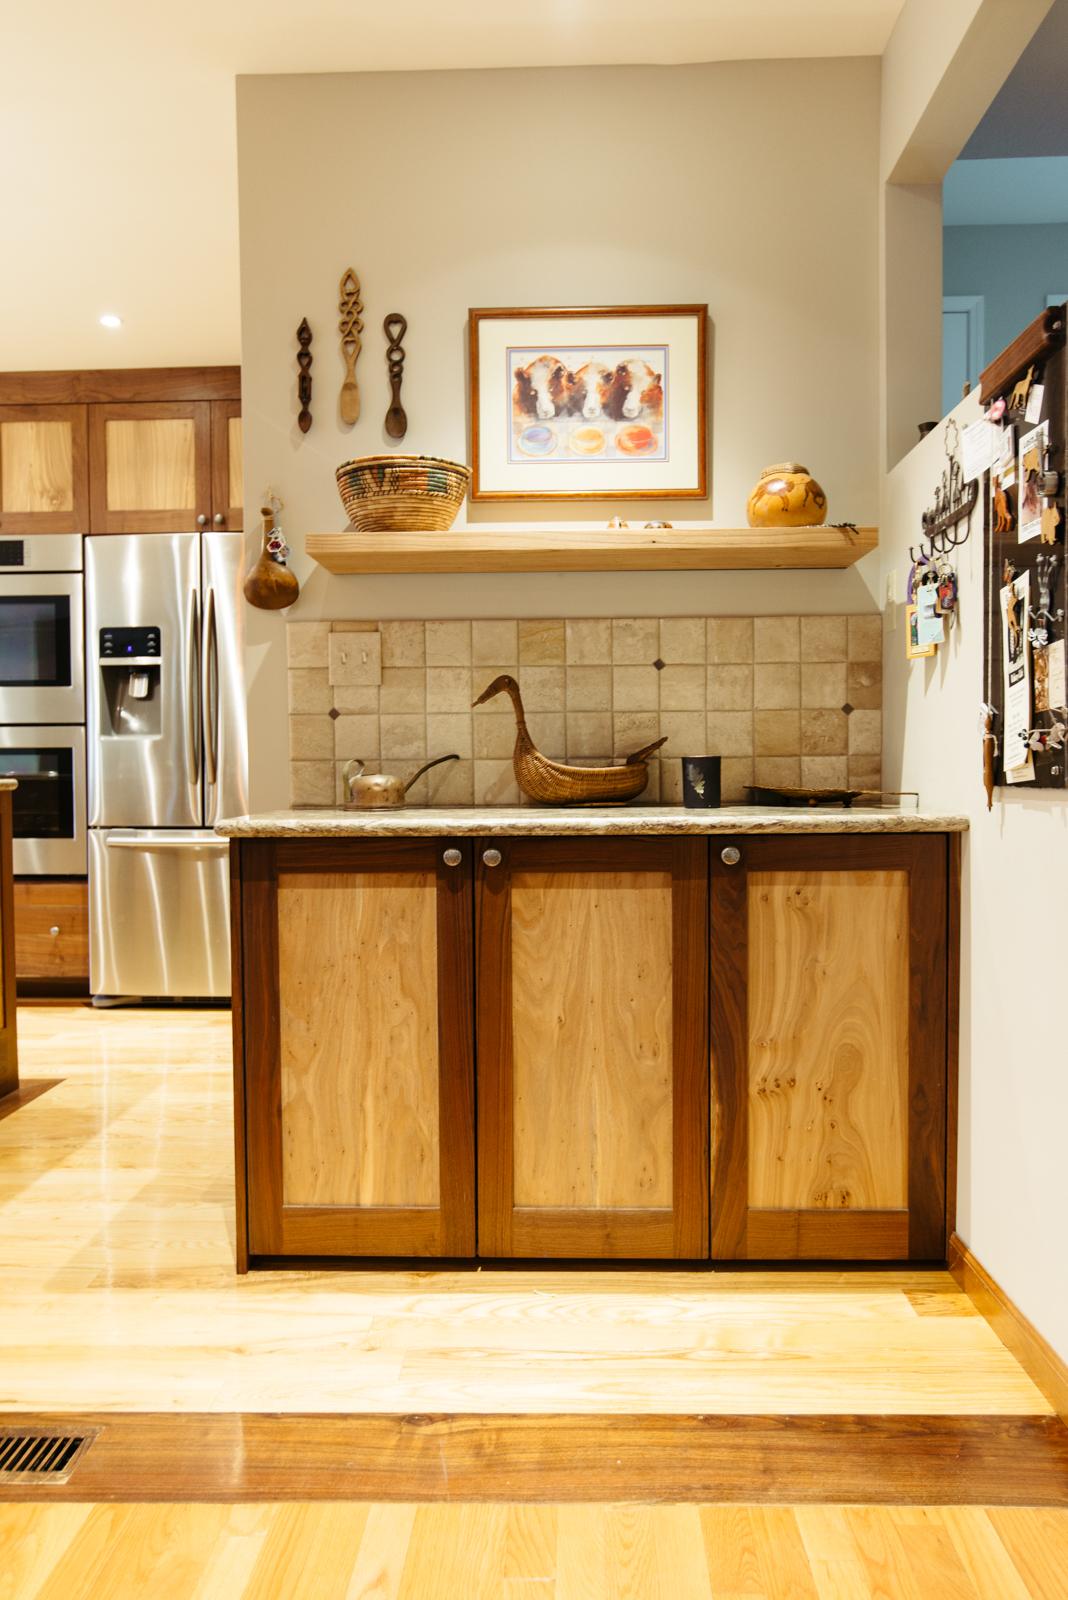 ©StructRestruct_841_kitchendiningsunroom_2017_1600px-9.jpg